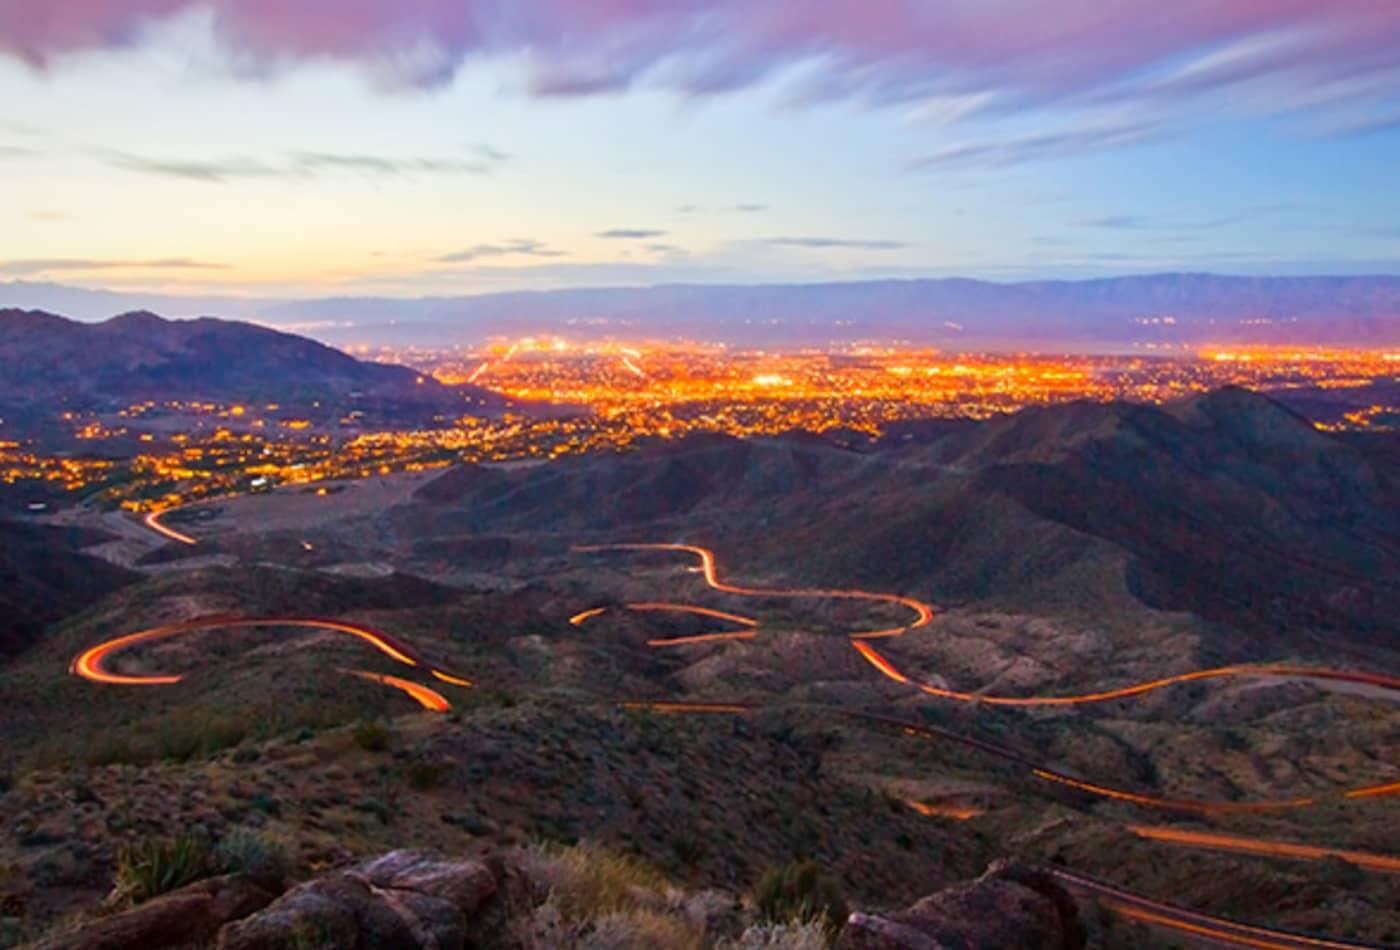 US-municipalities-that-went-bankrupt-desert-hot-springs.jpg